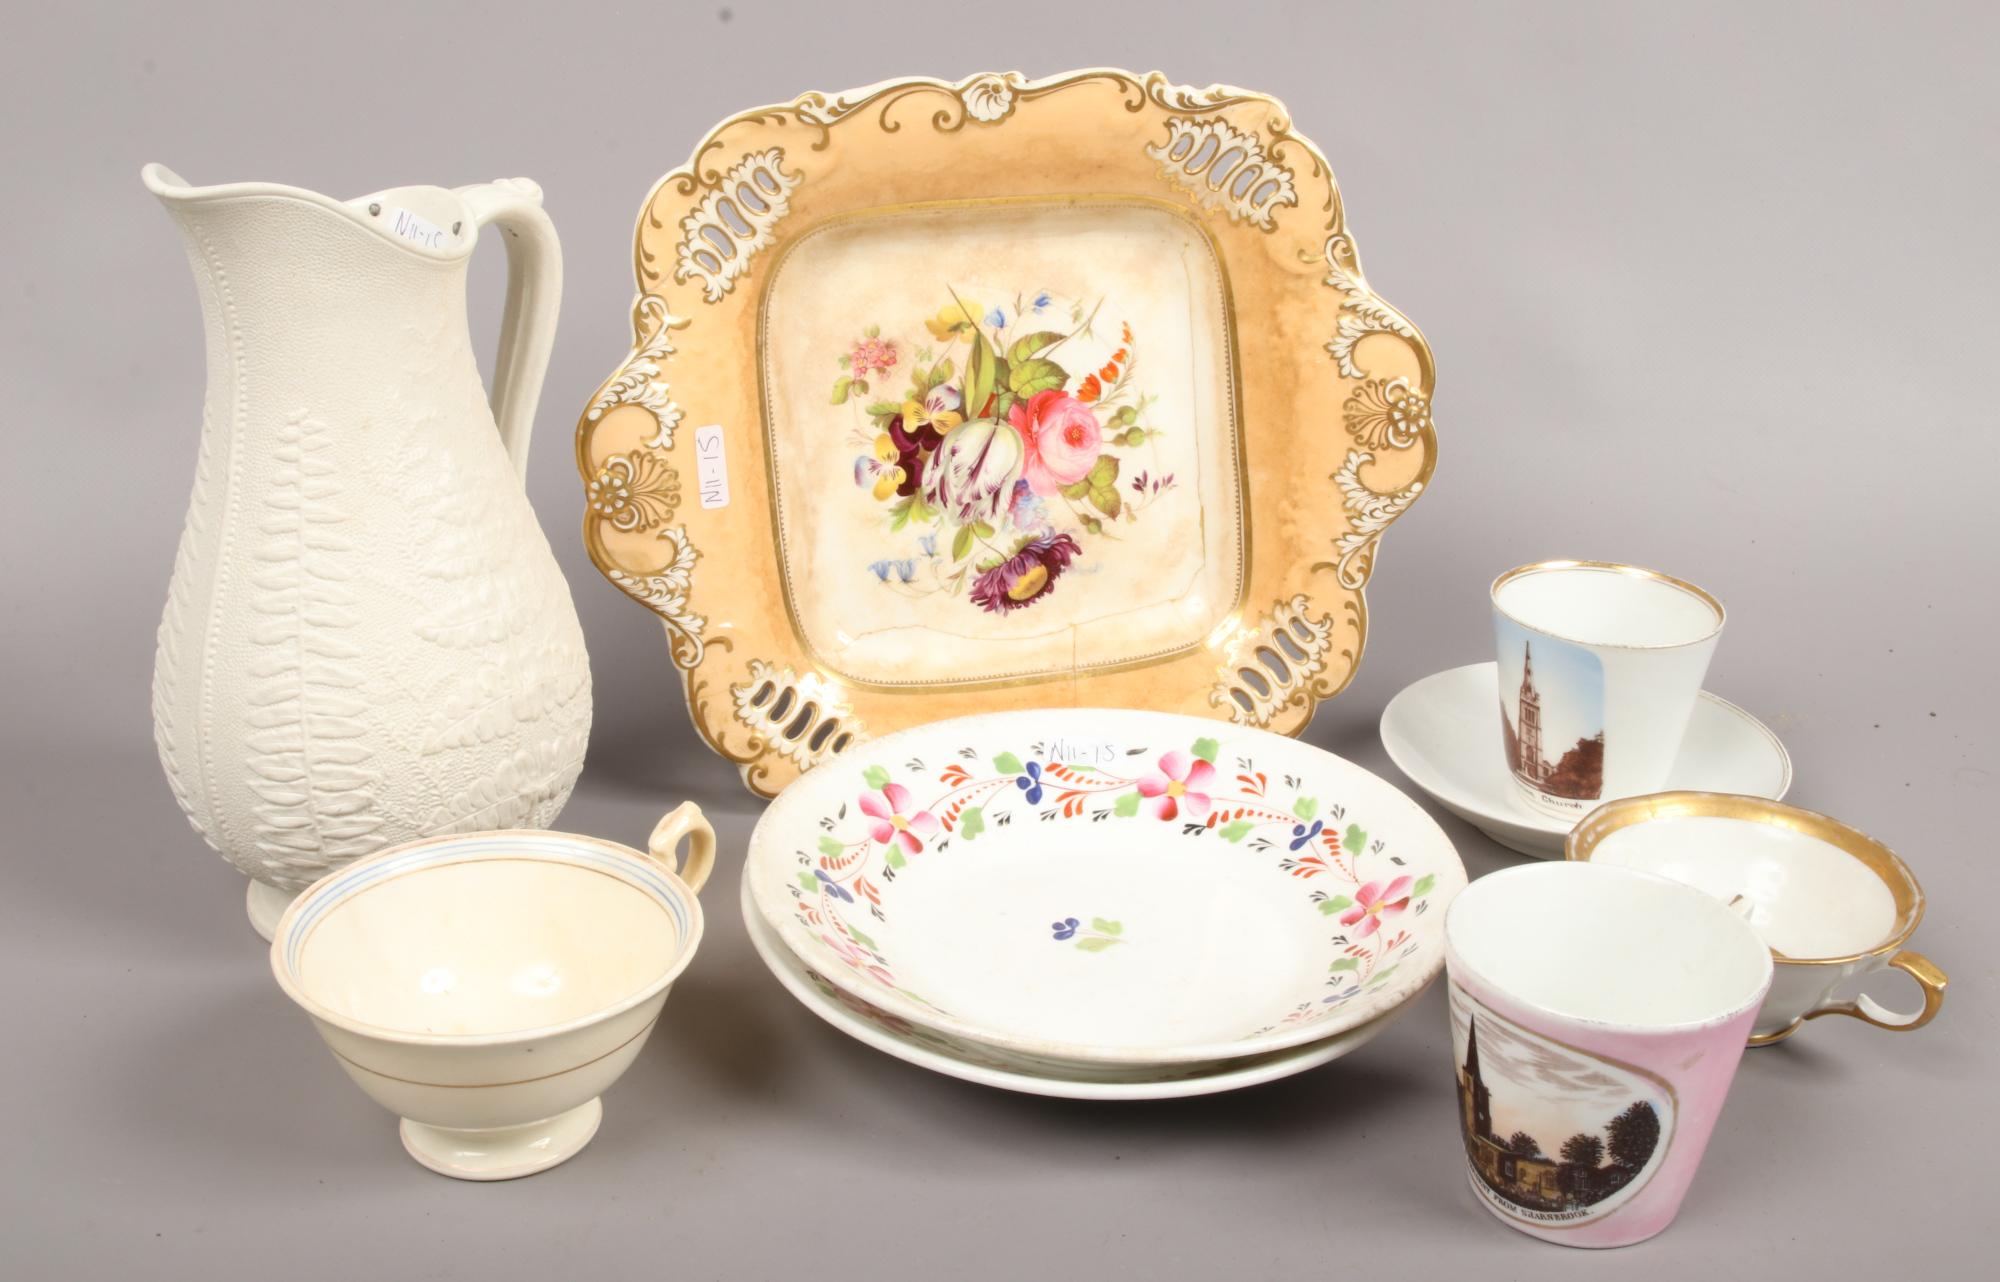 Lot 55 - A quantity of mostly 19th century ceramics including a white stoneware jug, porcelain crested